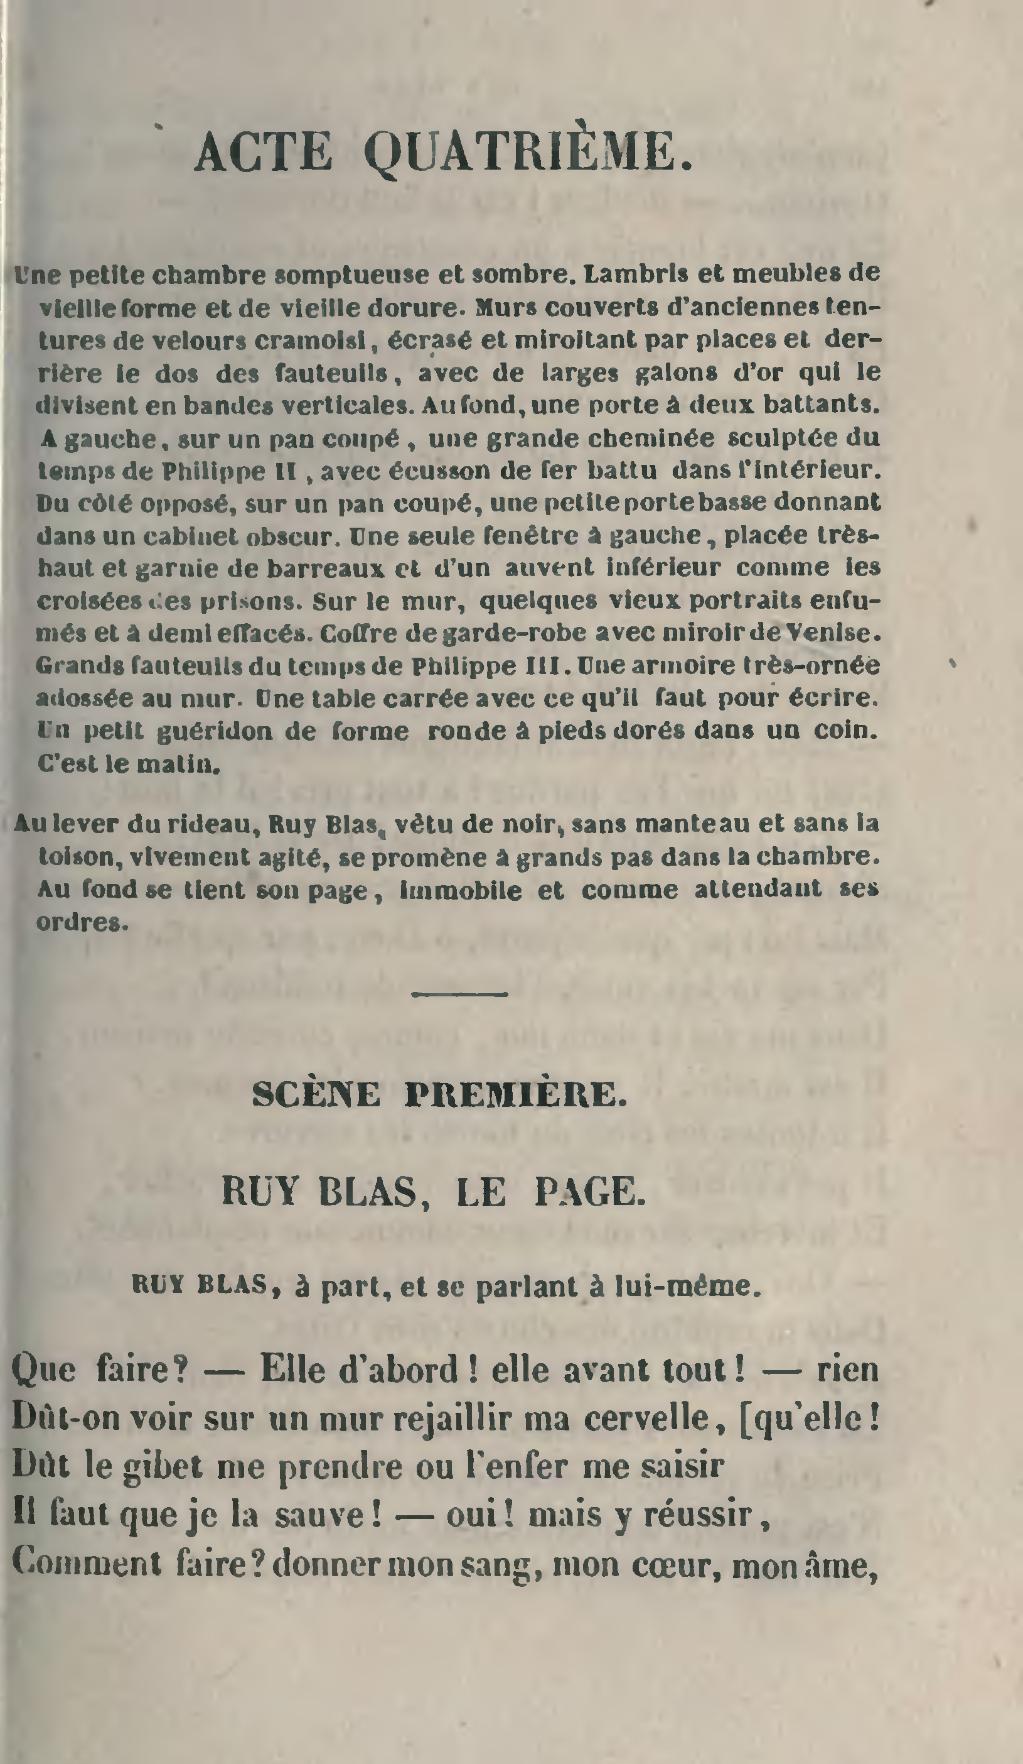 Page Hugo Ruy Blas Edition 1839 Djvu 155 Wikisource